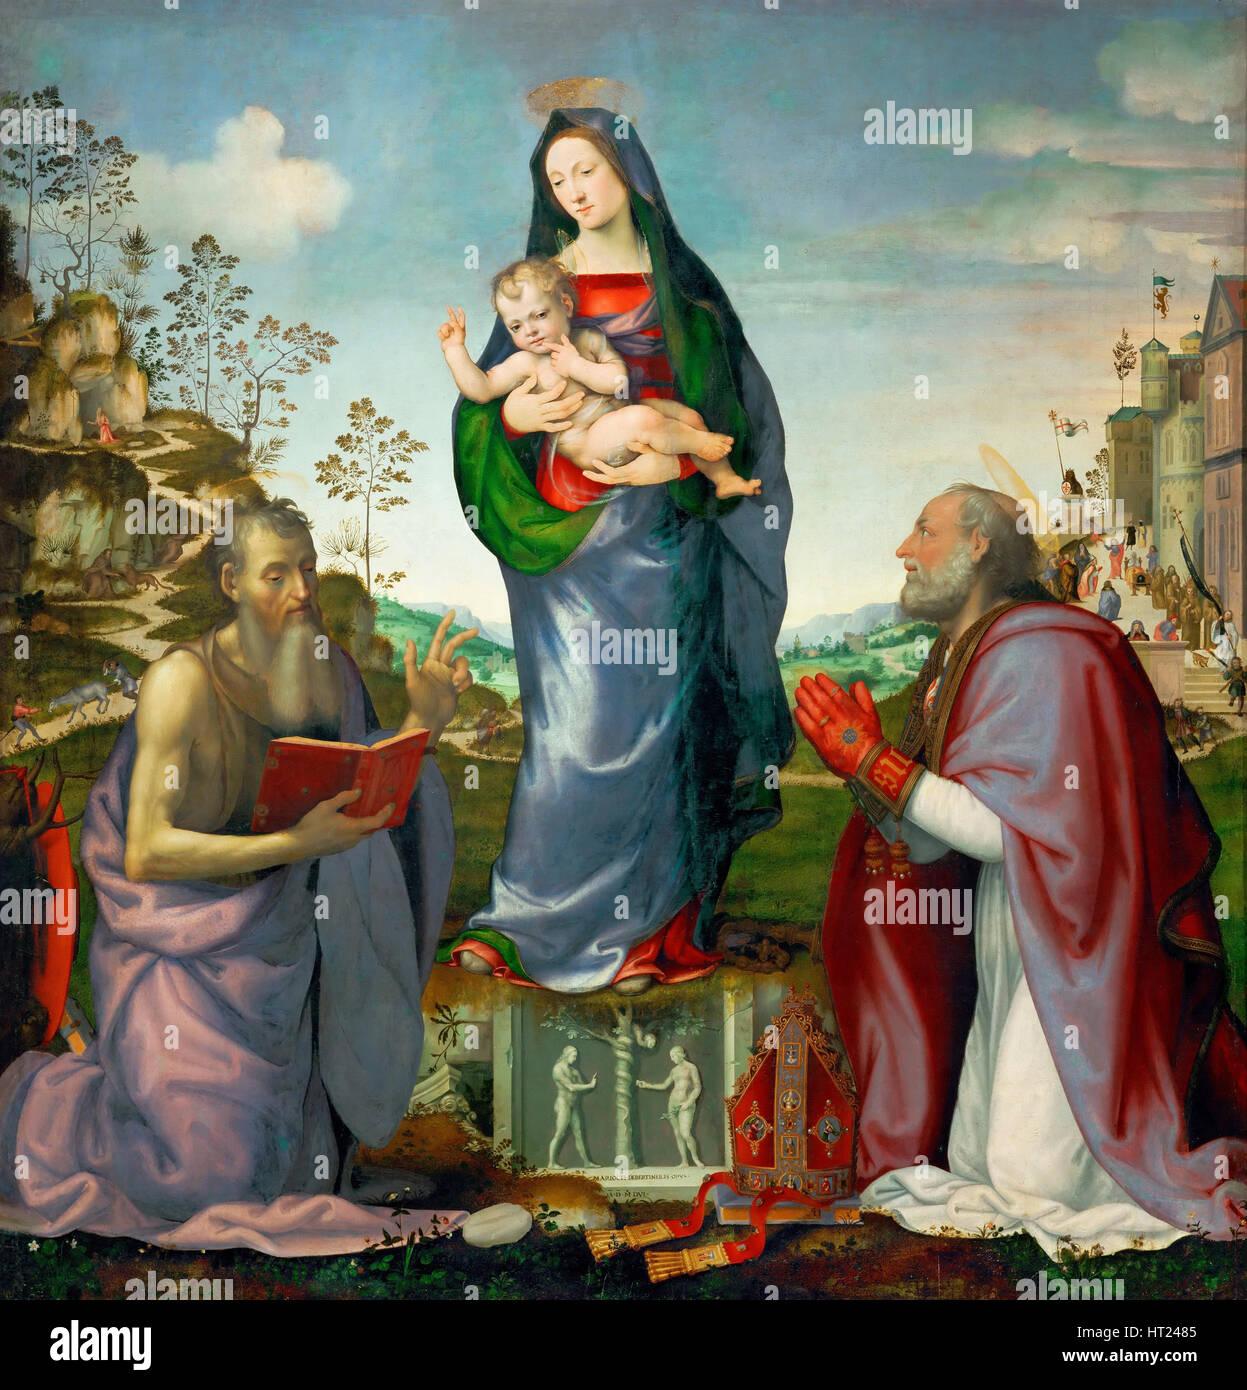 Madonna and Child with Saints James and Zenobius, 1506. Artist: Albertinelli, Mariotto (1474-1515) - Stock Image